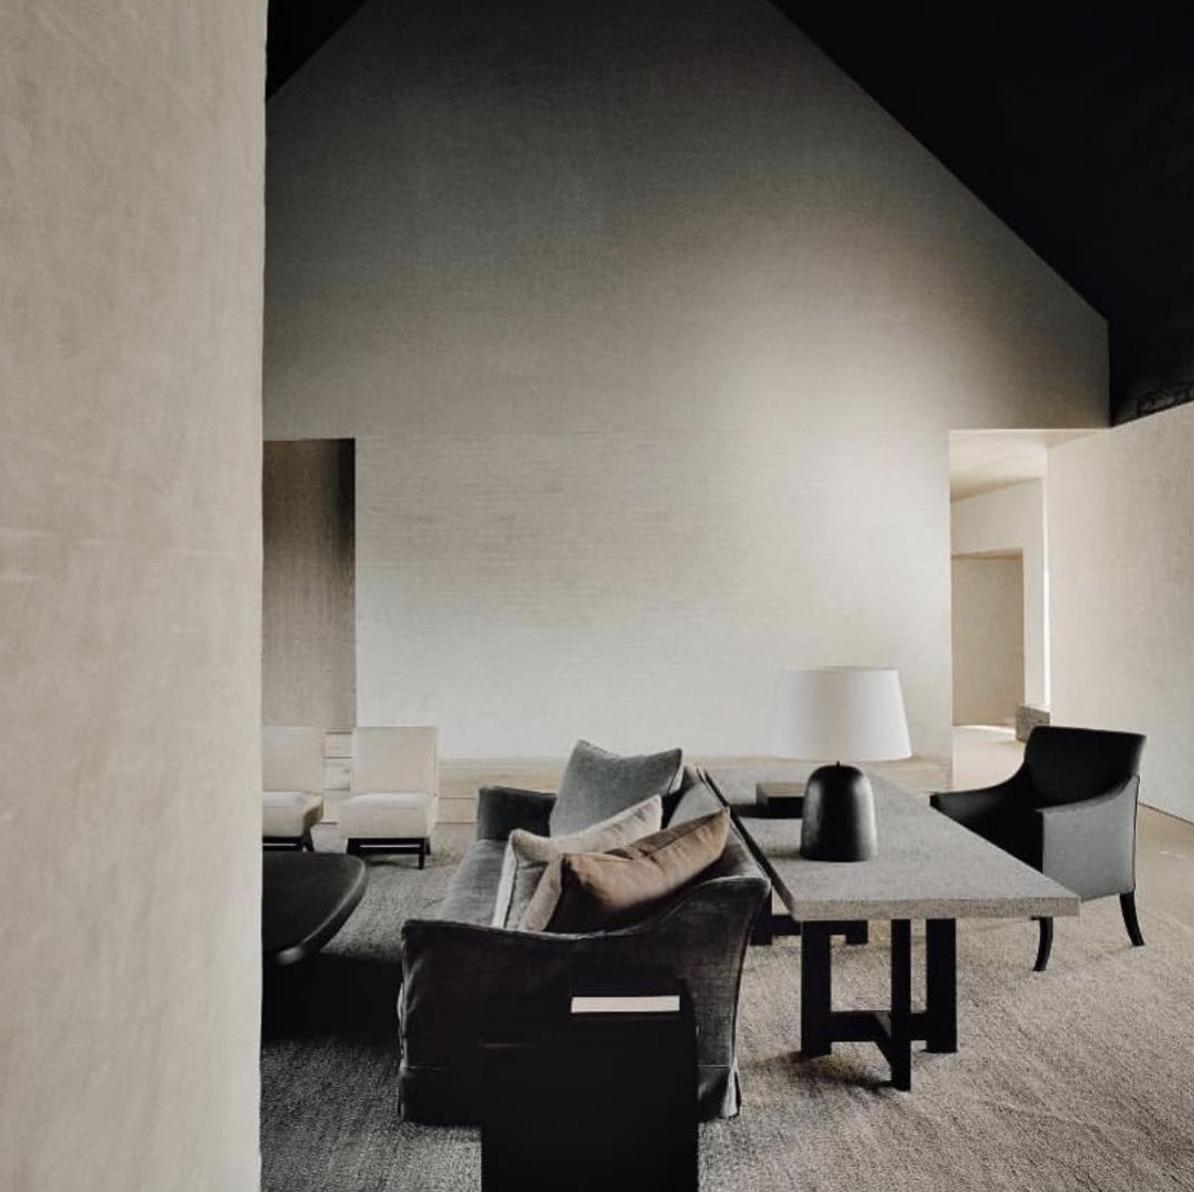 VO Residence, Knokke, Belgium. Design by Vincent van Duysen